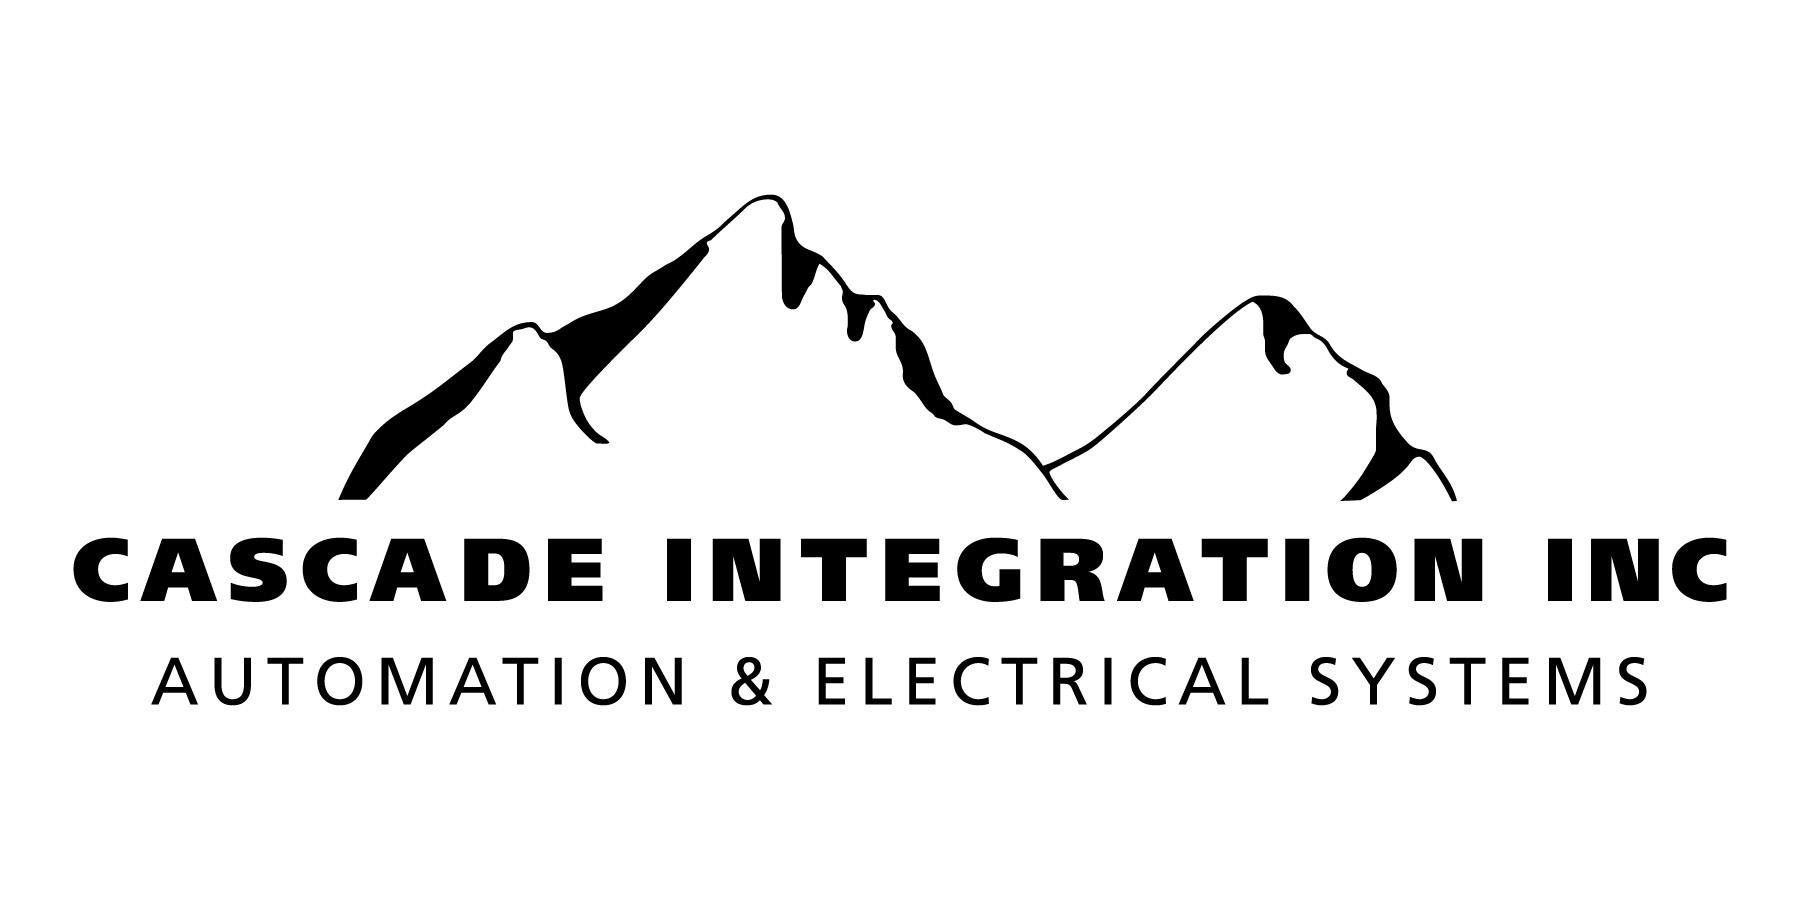 Cascade Integration Grows By Going Paperless